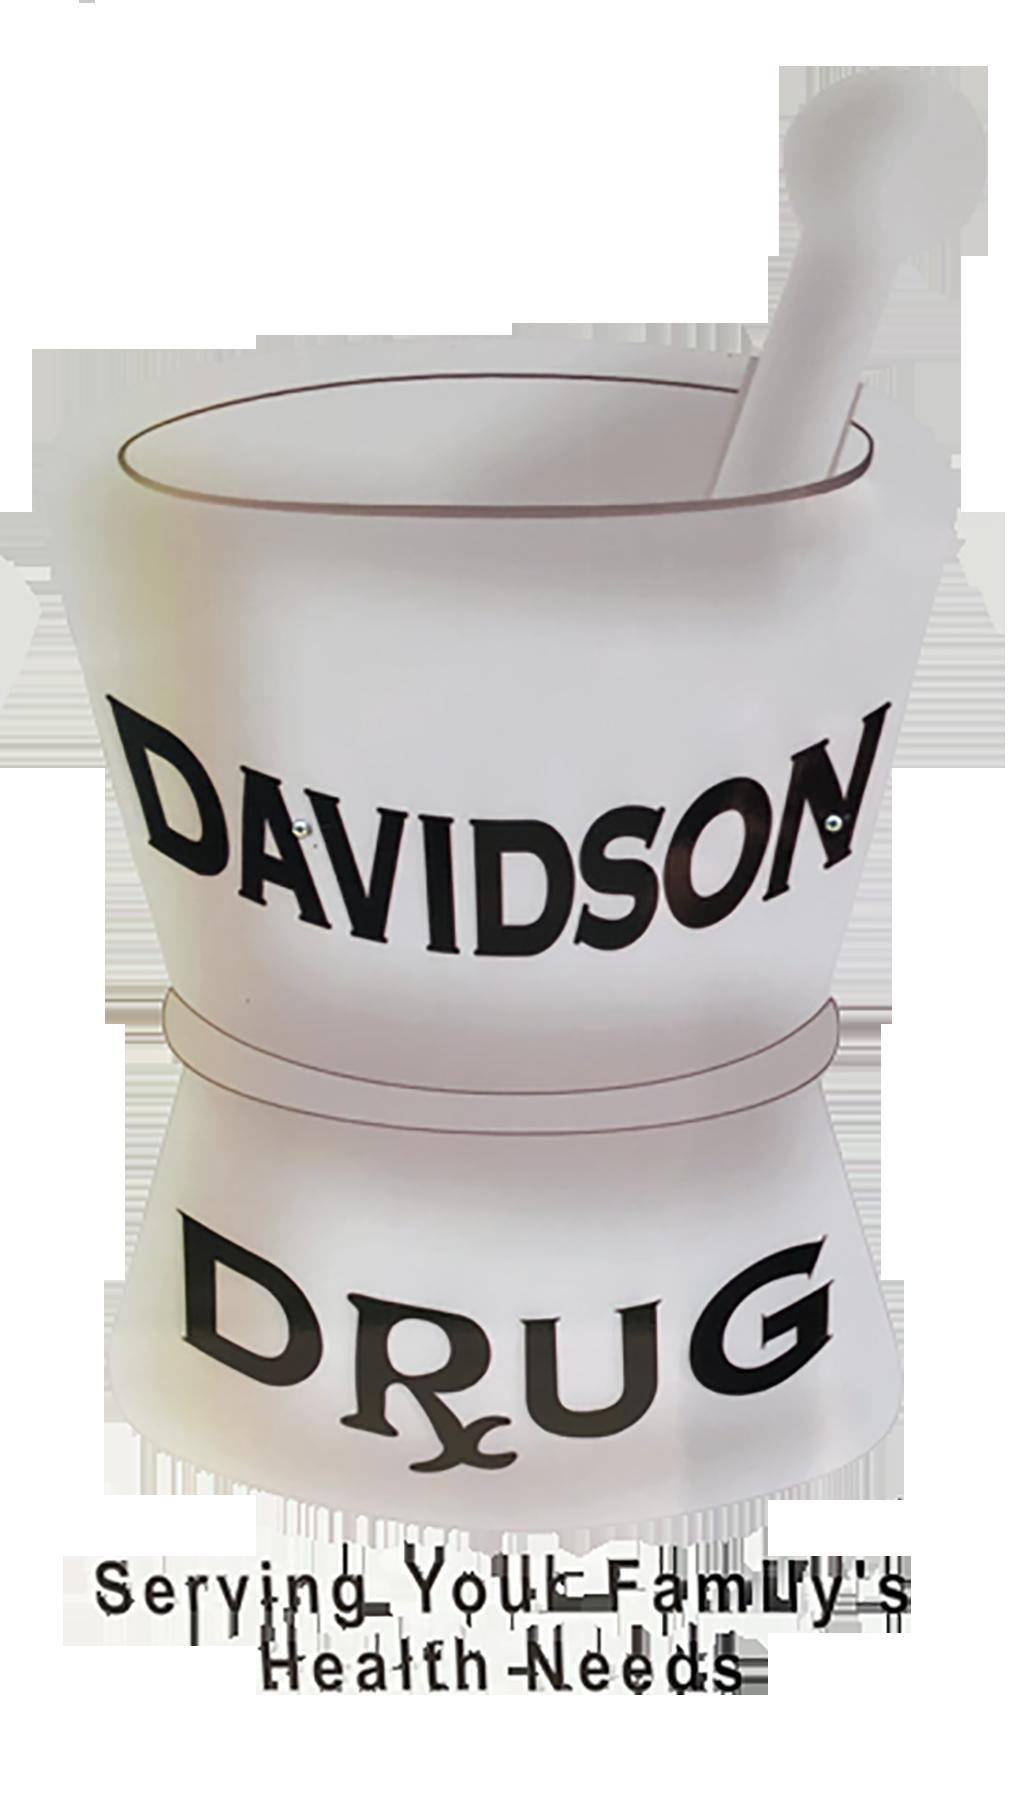 Davidson Drug